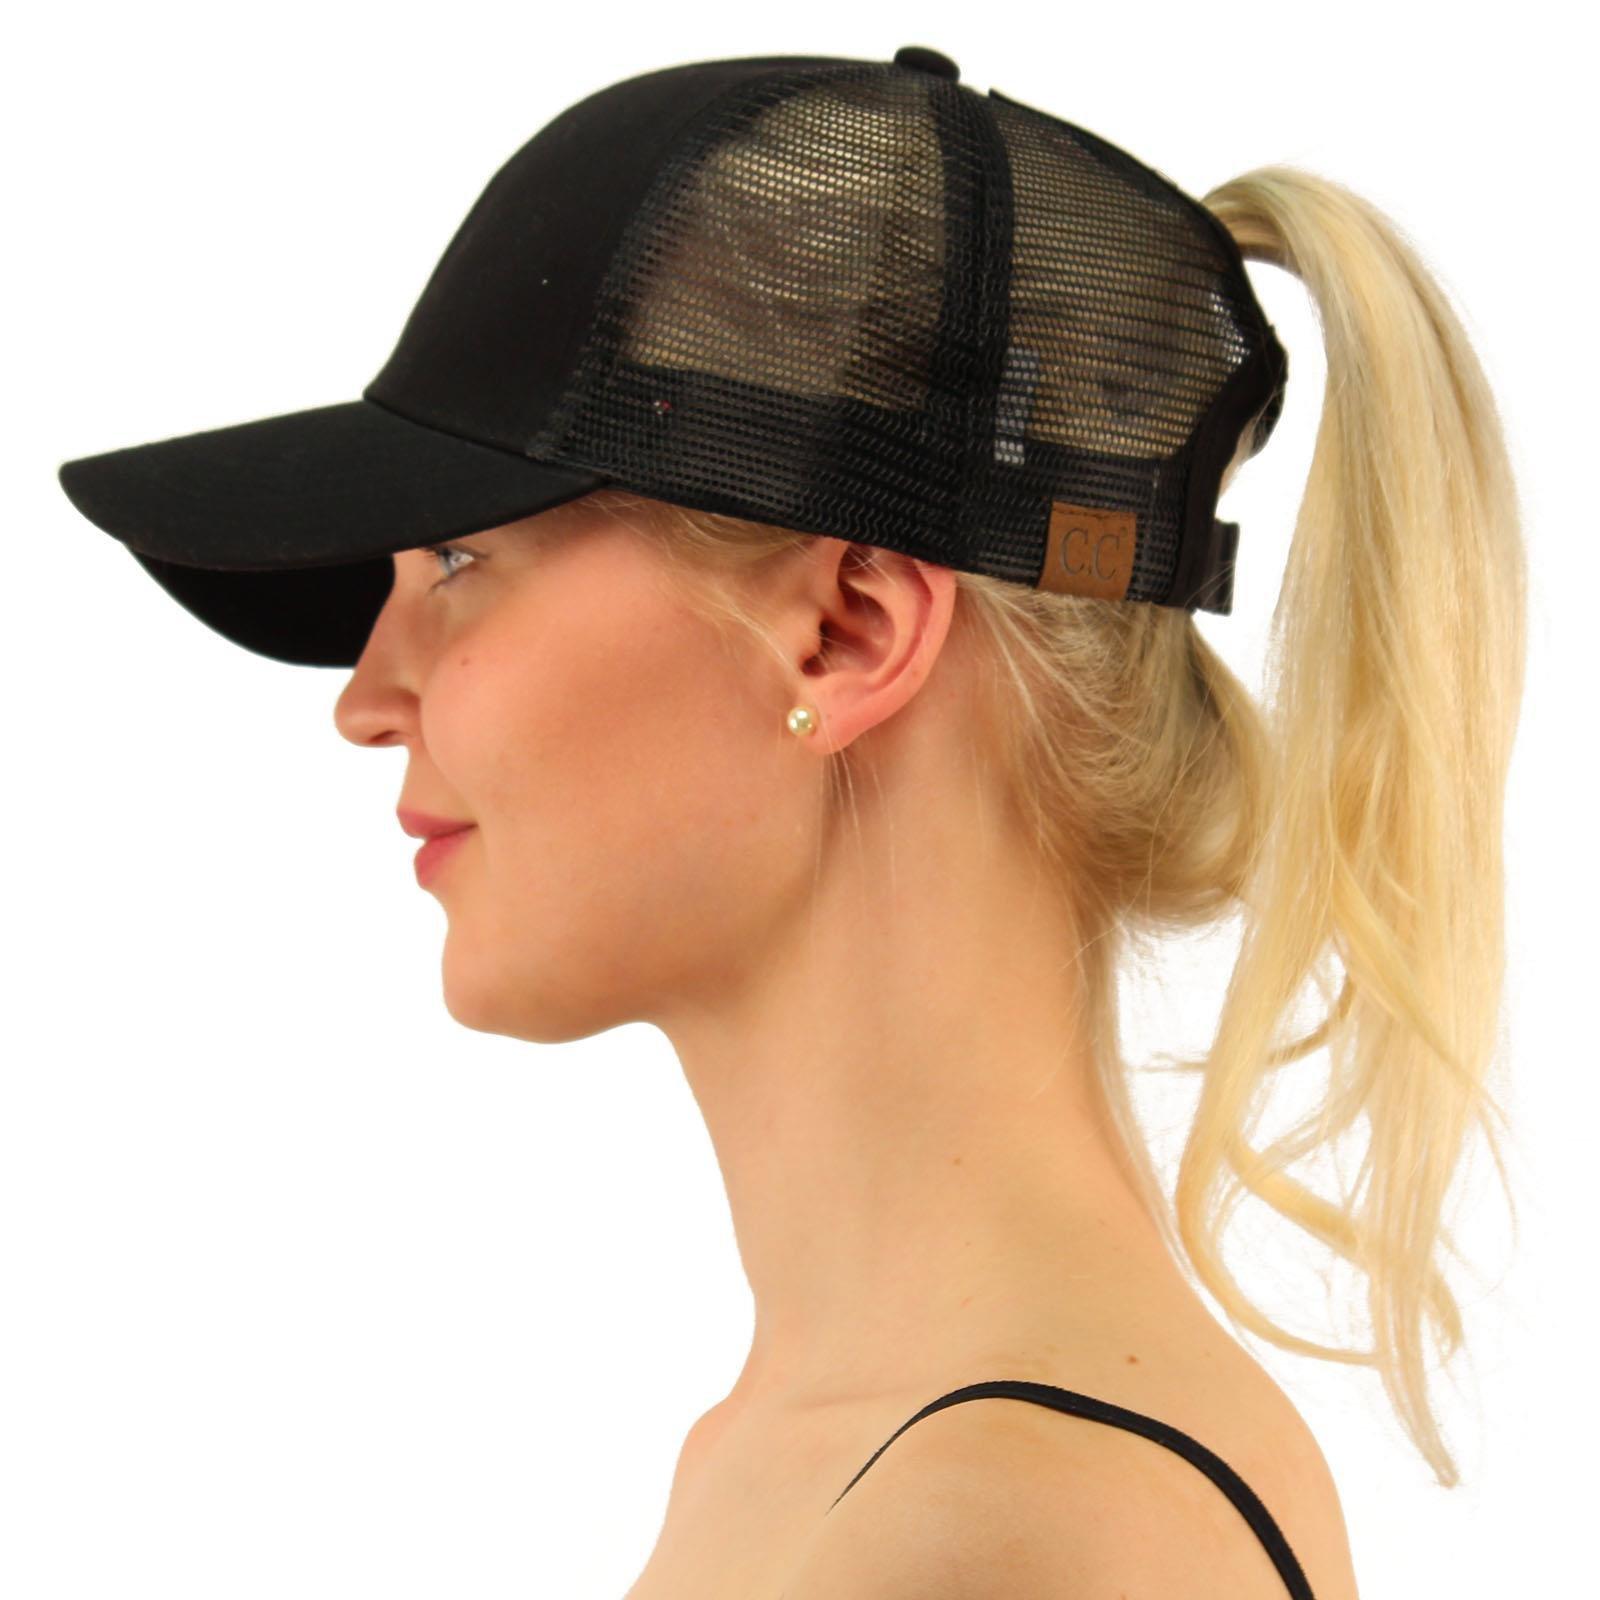 C.C Ponytail Messy Buns Trucker Ponycaps Plain Baseball Visor Cap Dad Hat Black